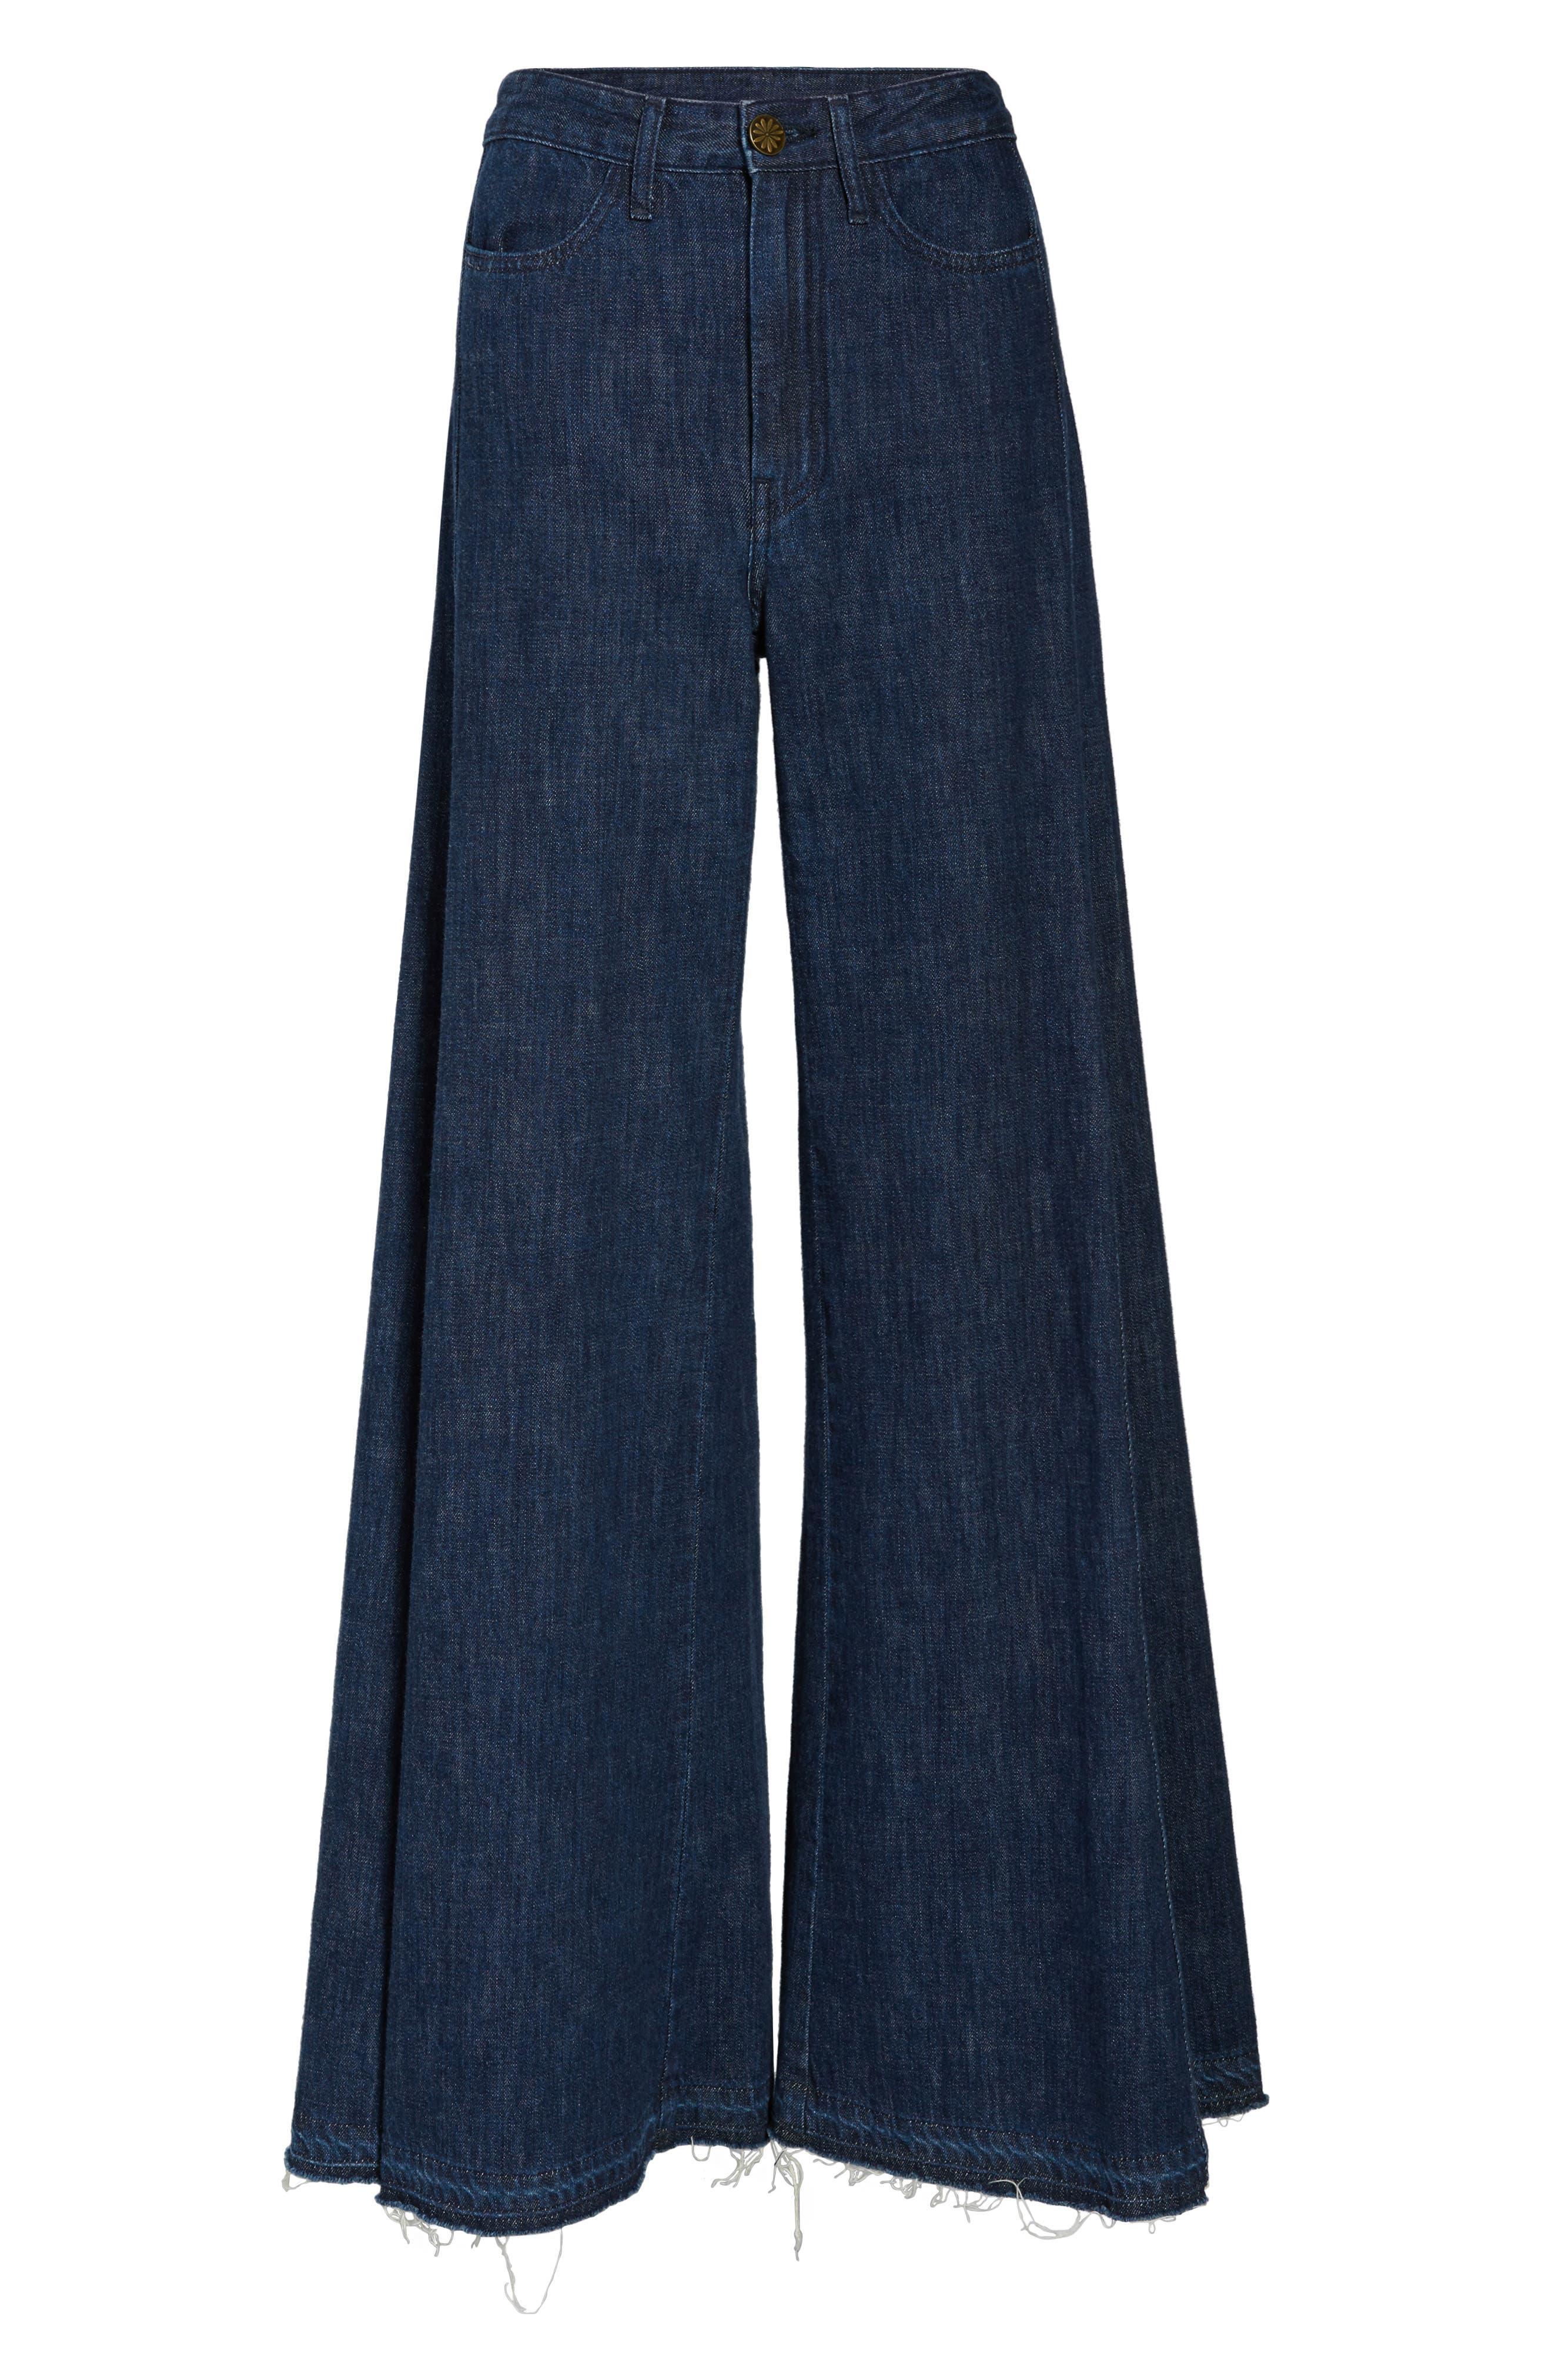 San Fran Super Flare Denim Pants,                             Alternate thumbnail 6, color,                             400